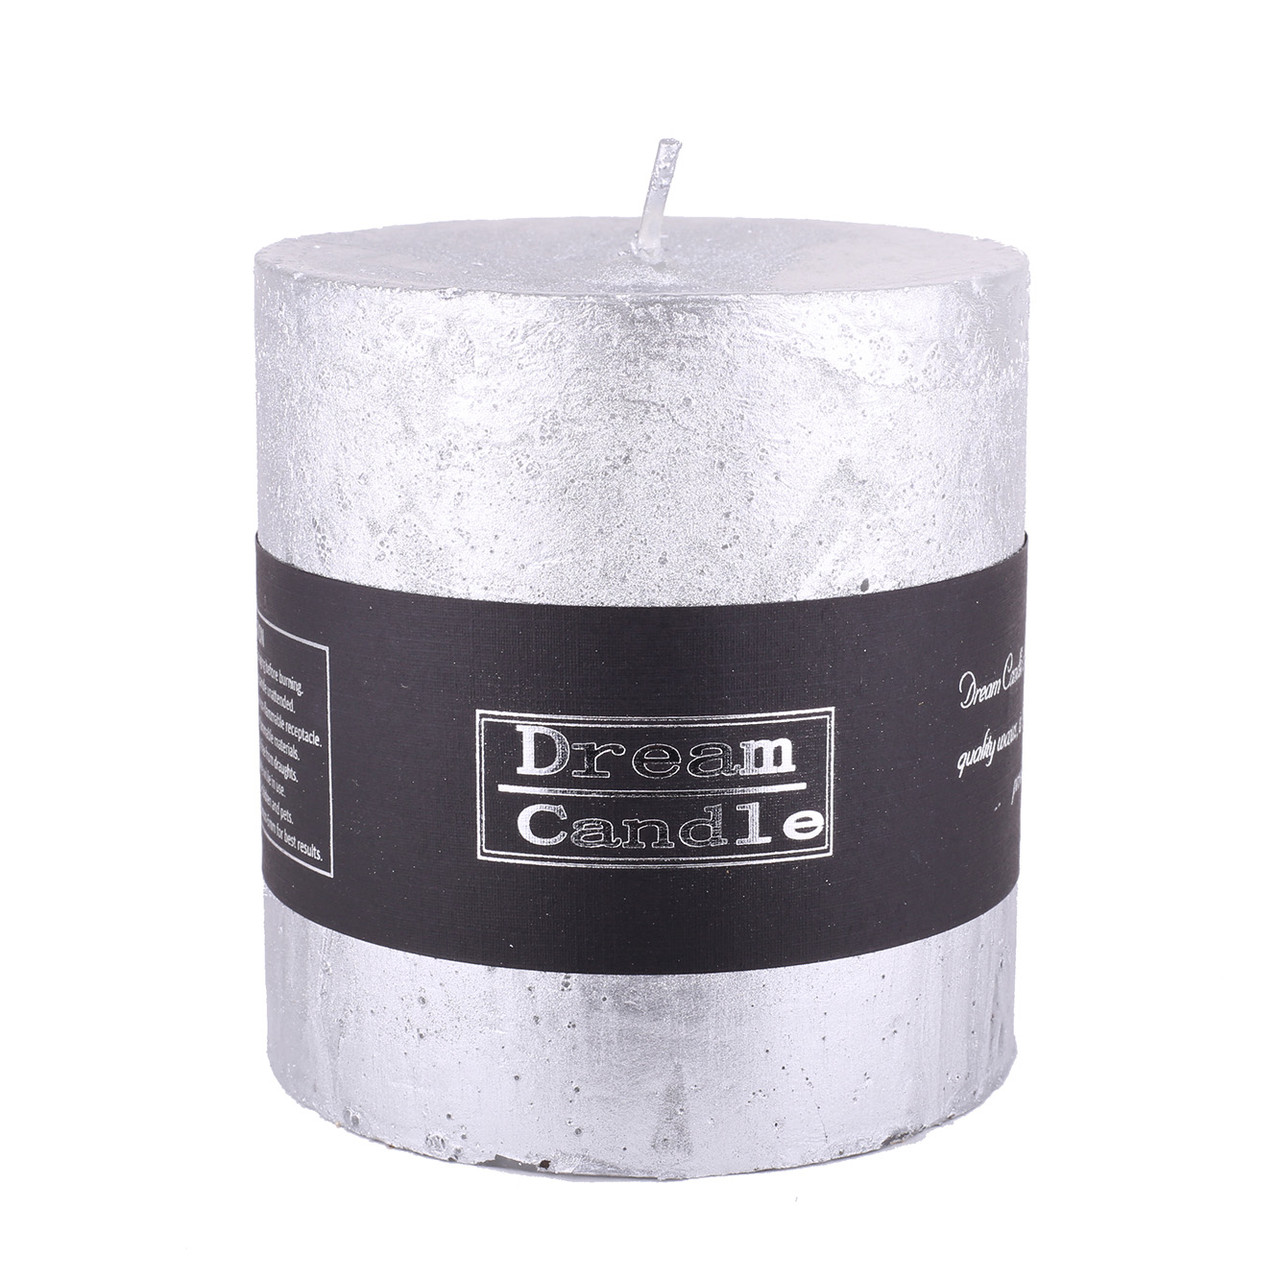 Свеча BOLTZE CANDLE METALLIC 410G silver 7080800-BZ